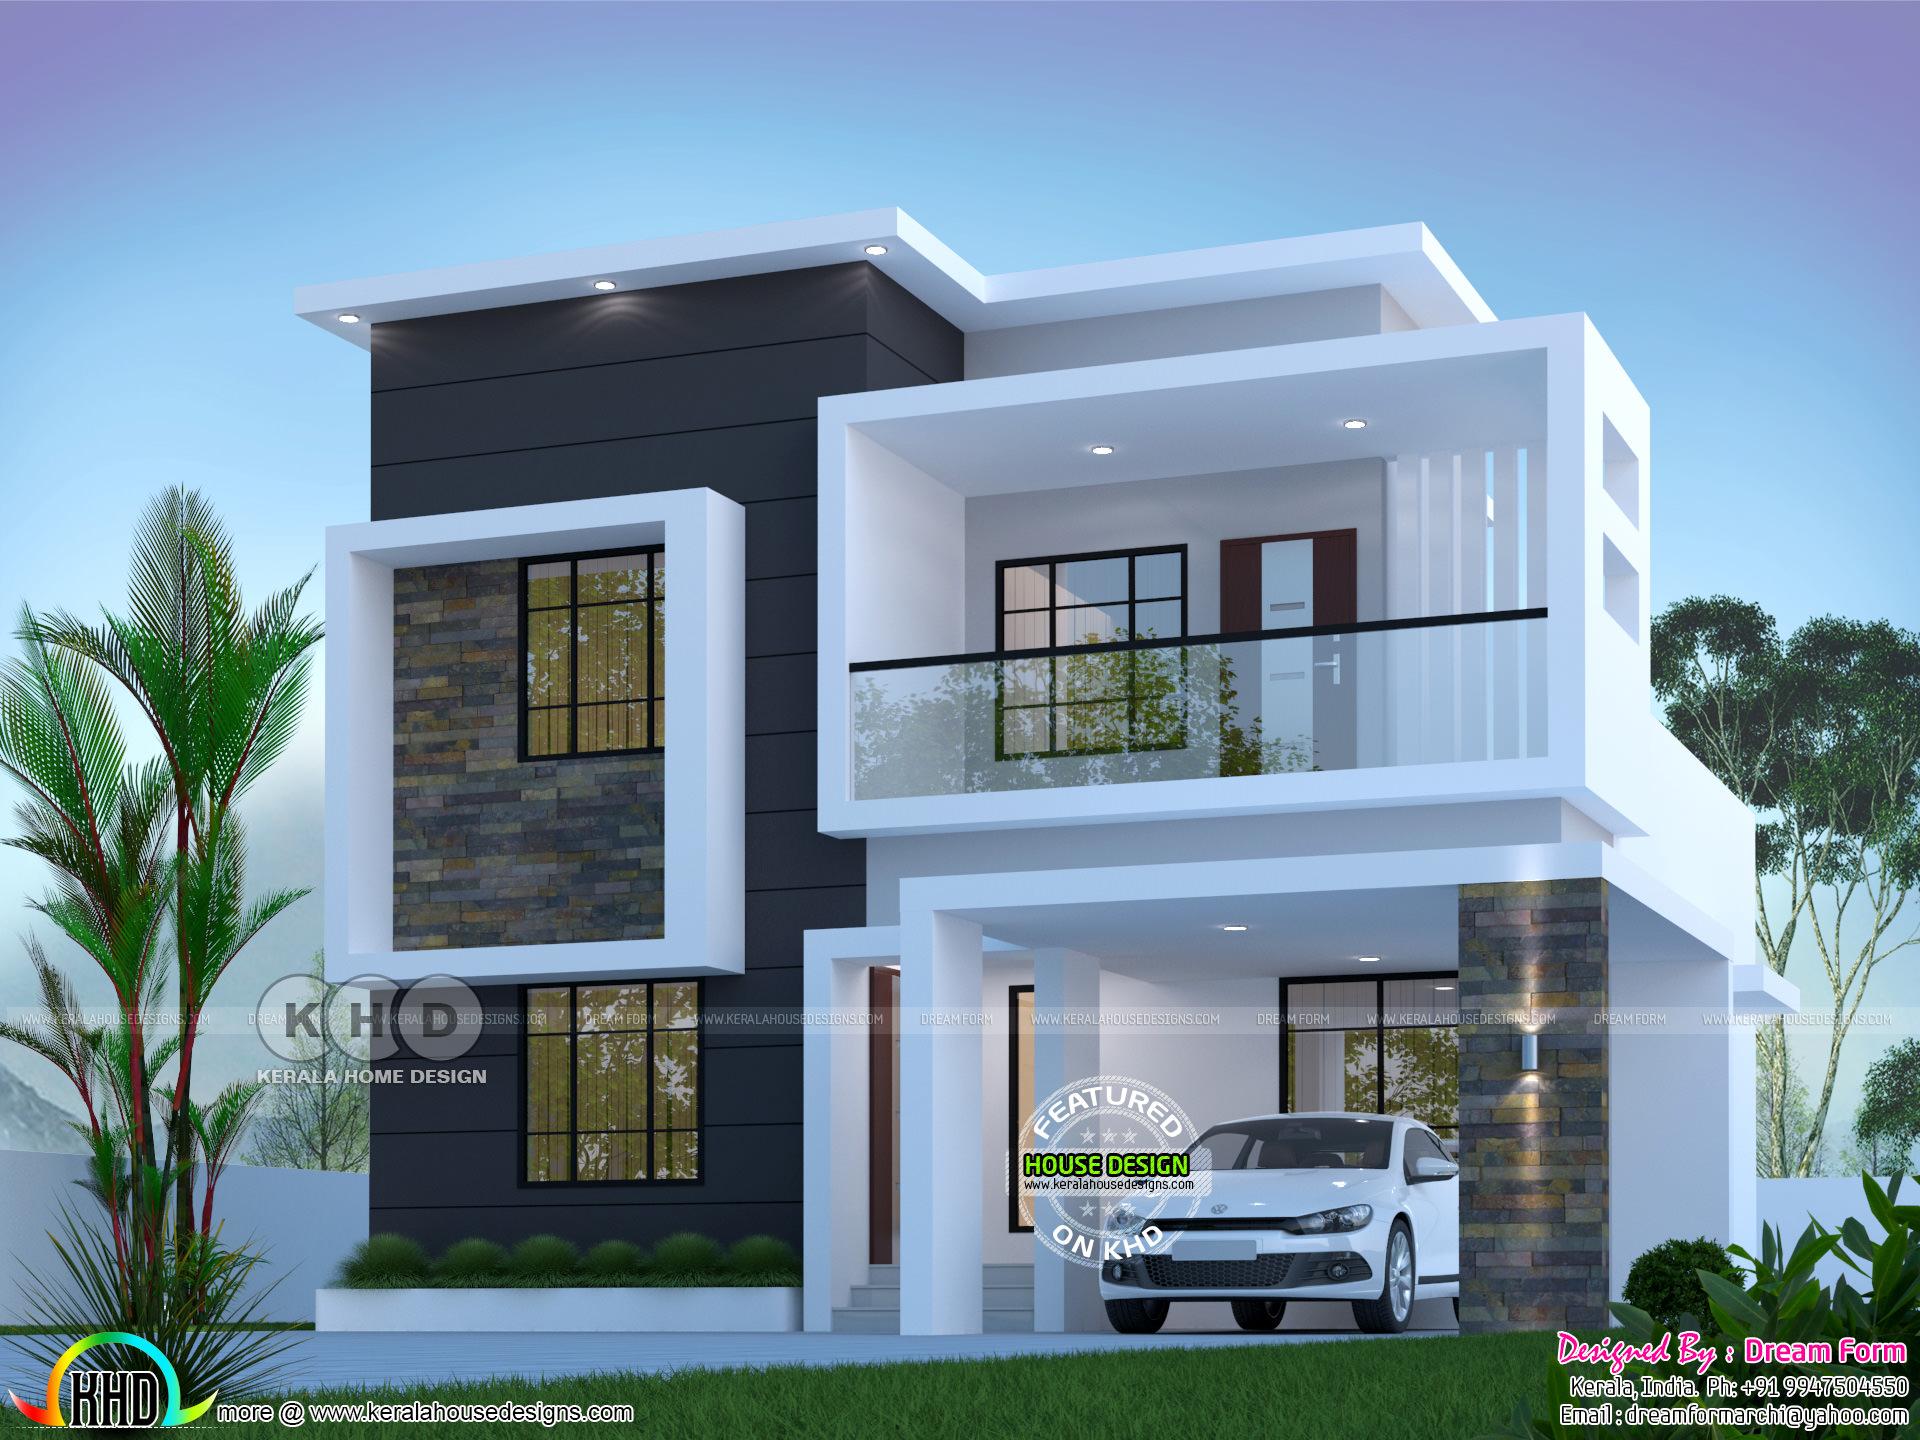 3 Bedroom 1800 Sq Ft Modern Home Design Kerala Home